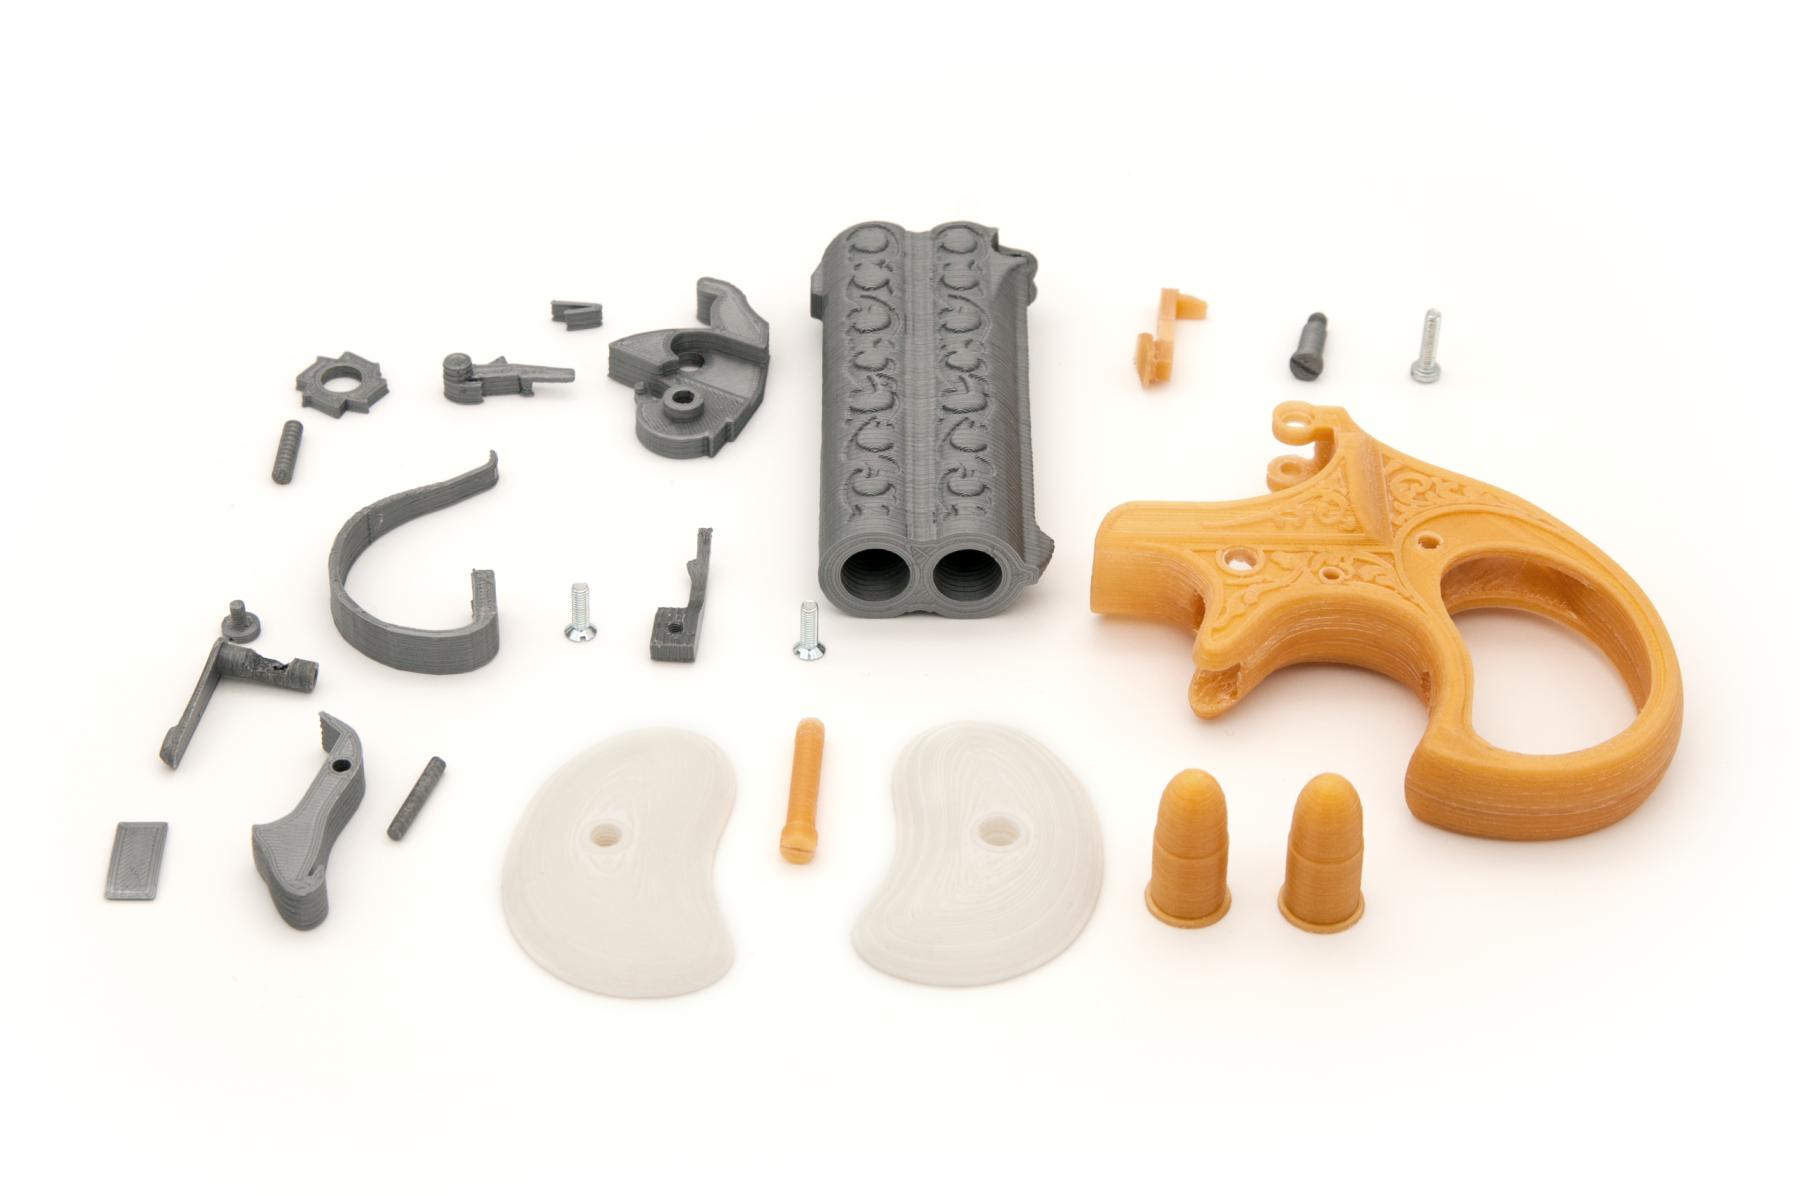 3D printed plastic model of the Remington Double Derringer all internal part